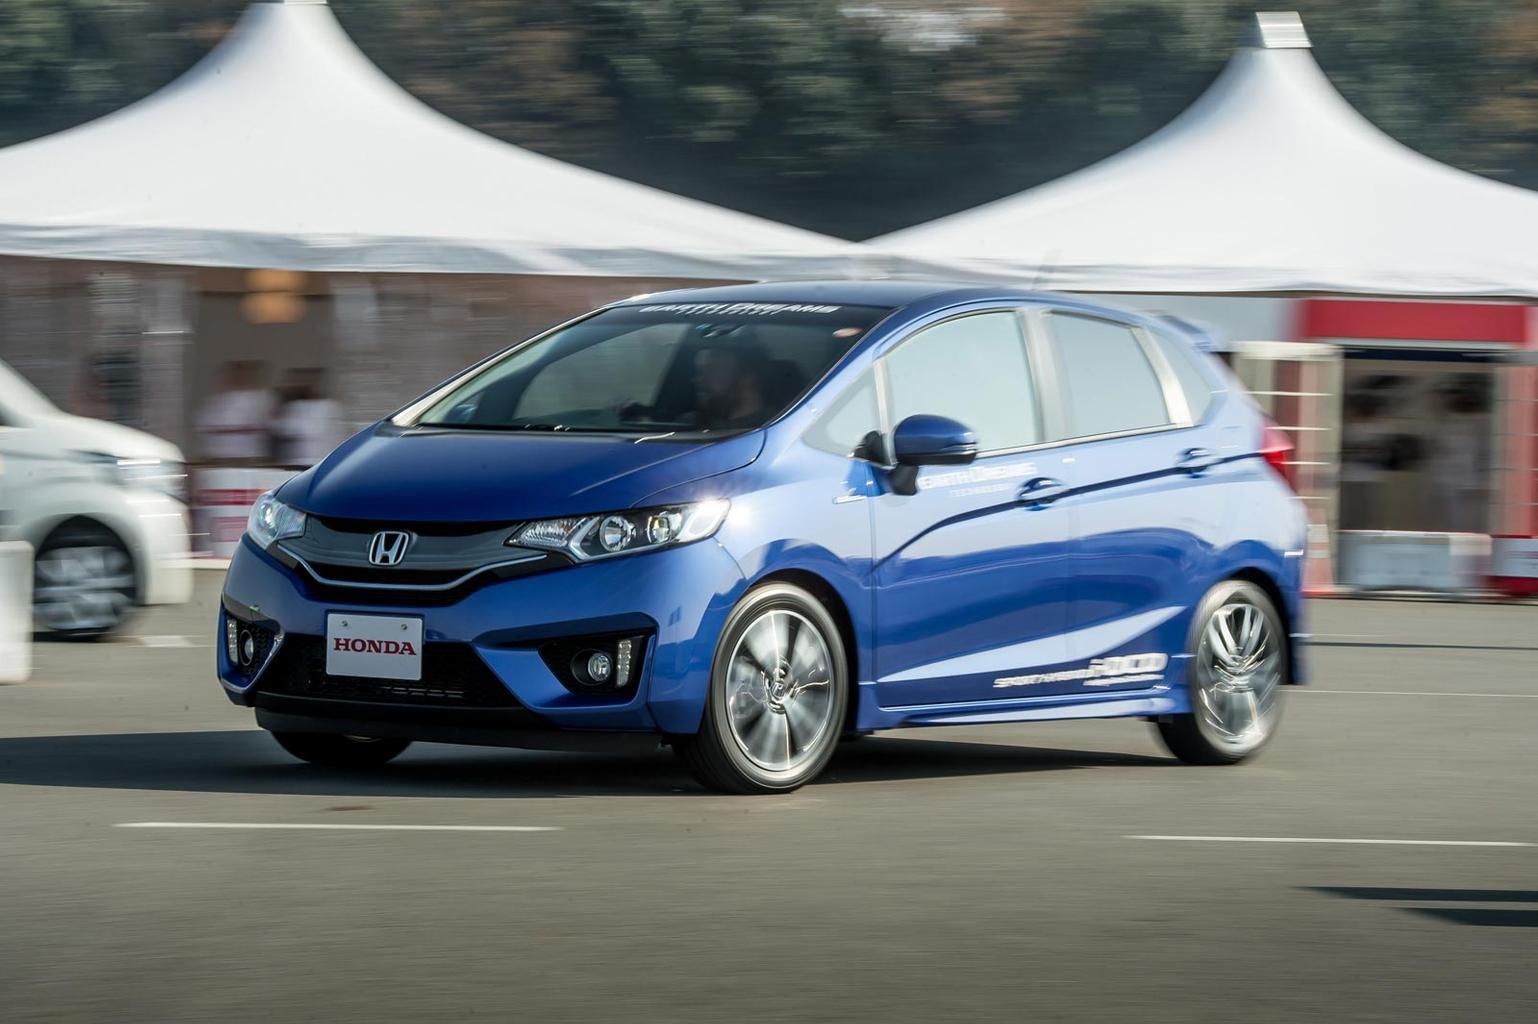 New Honda Jazz 'not until 2015'